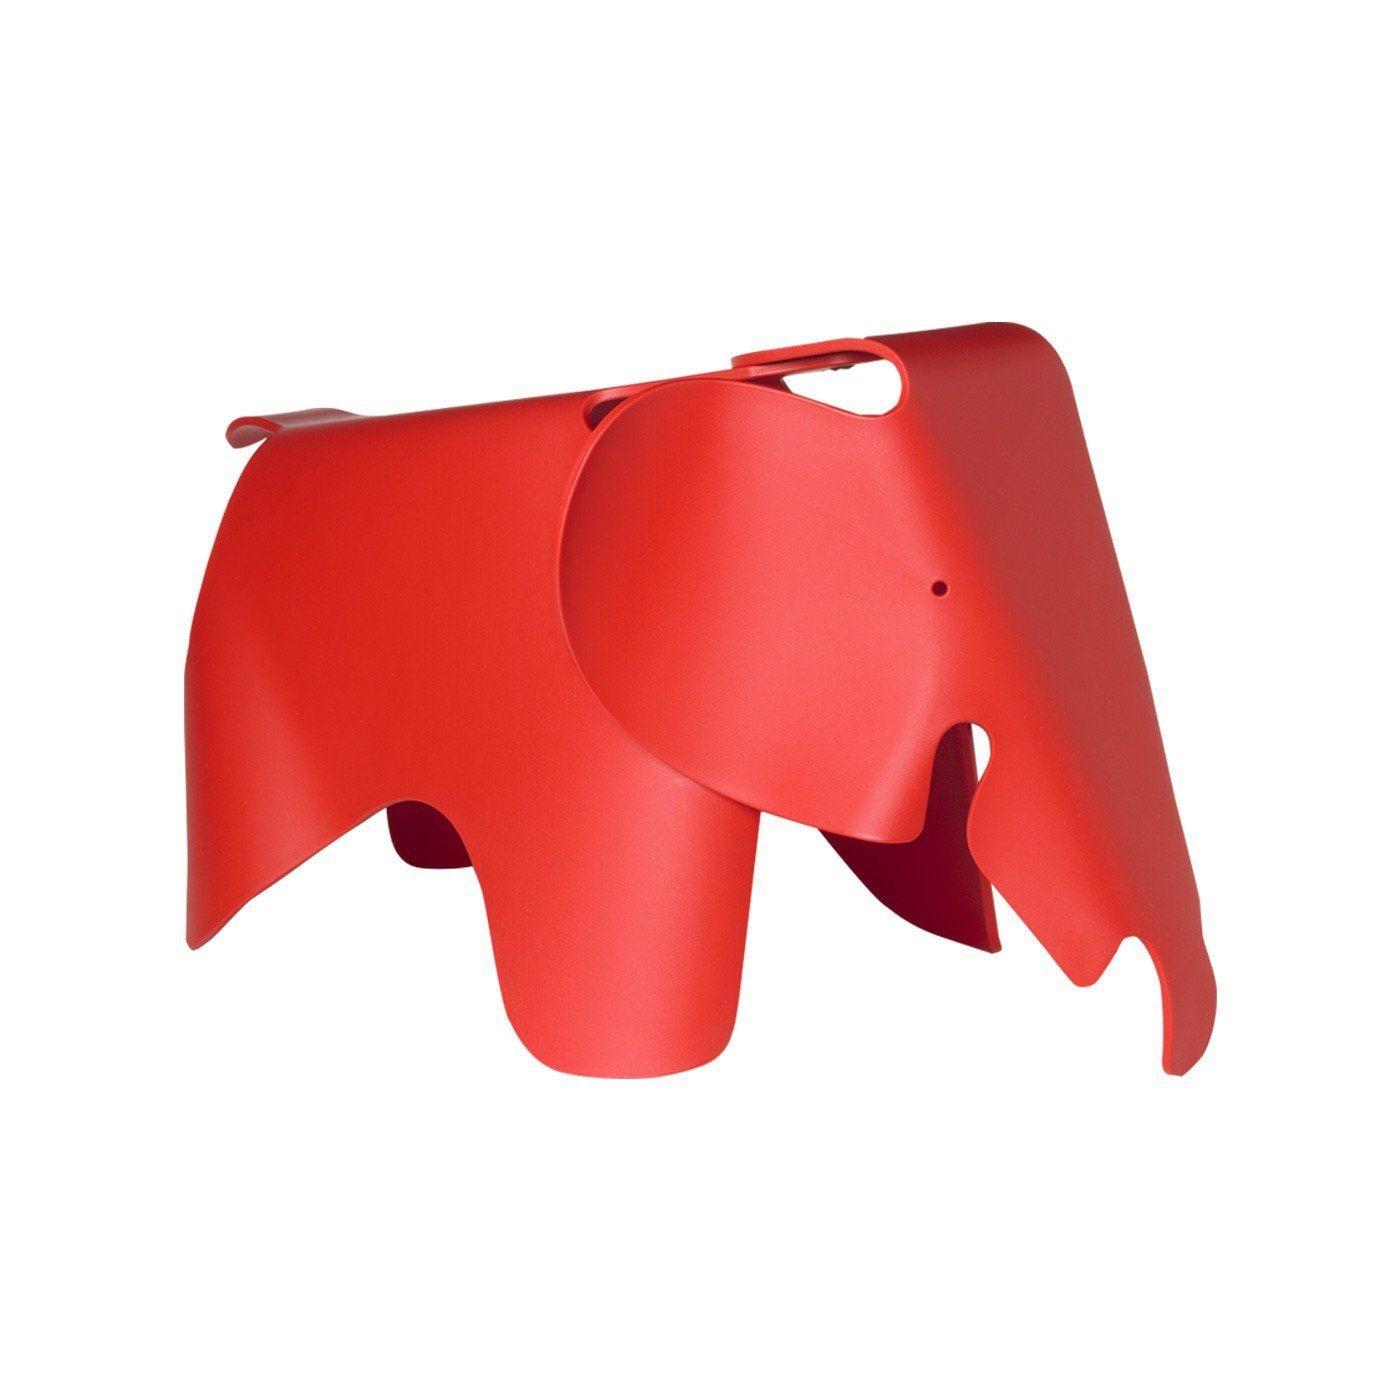 Vitra Eames Elephant small, weiß Eames, Dekoration, Idee